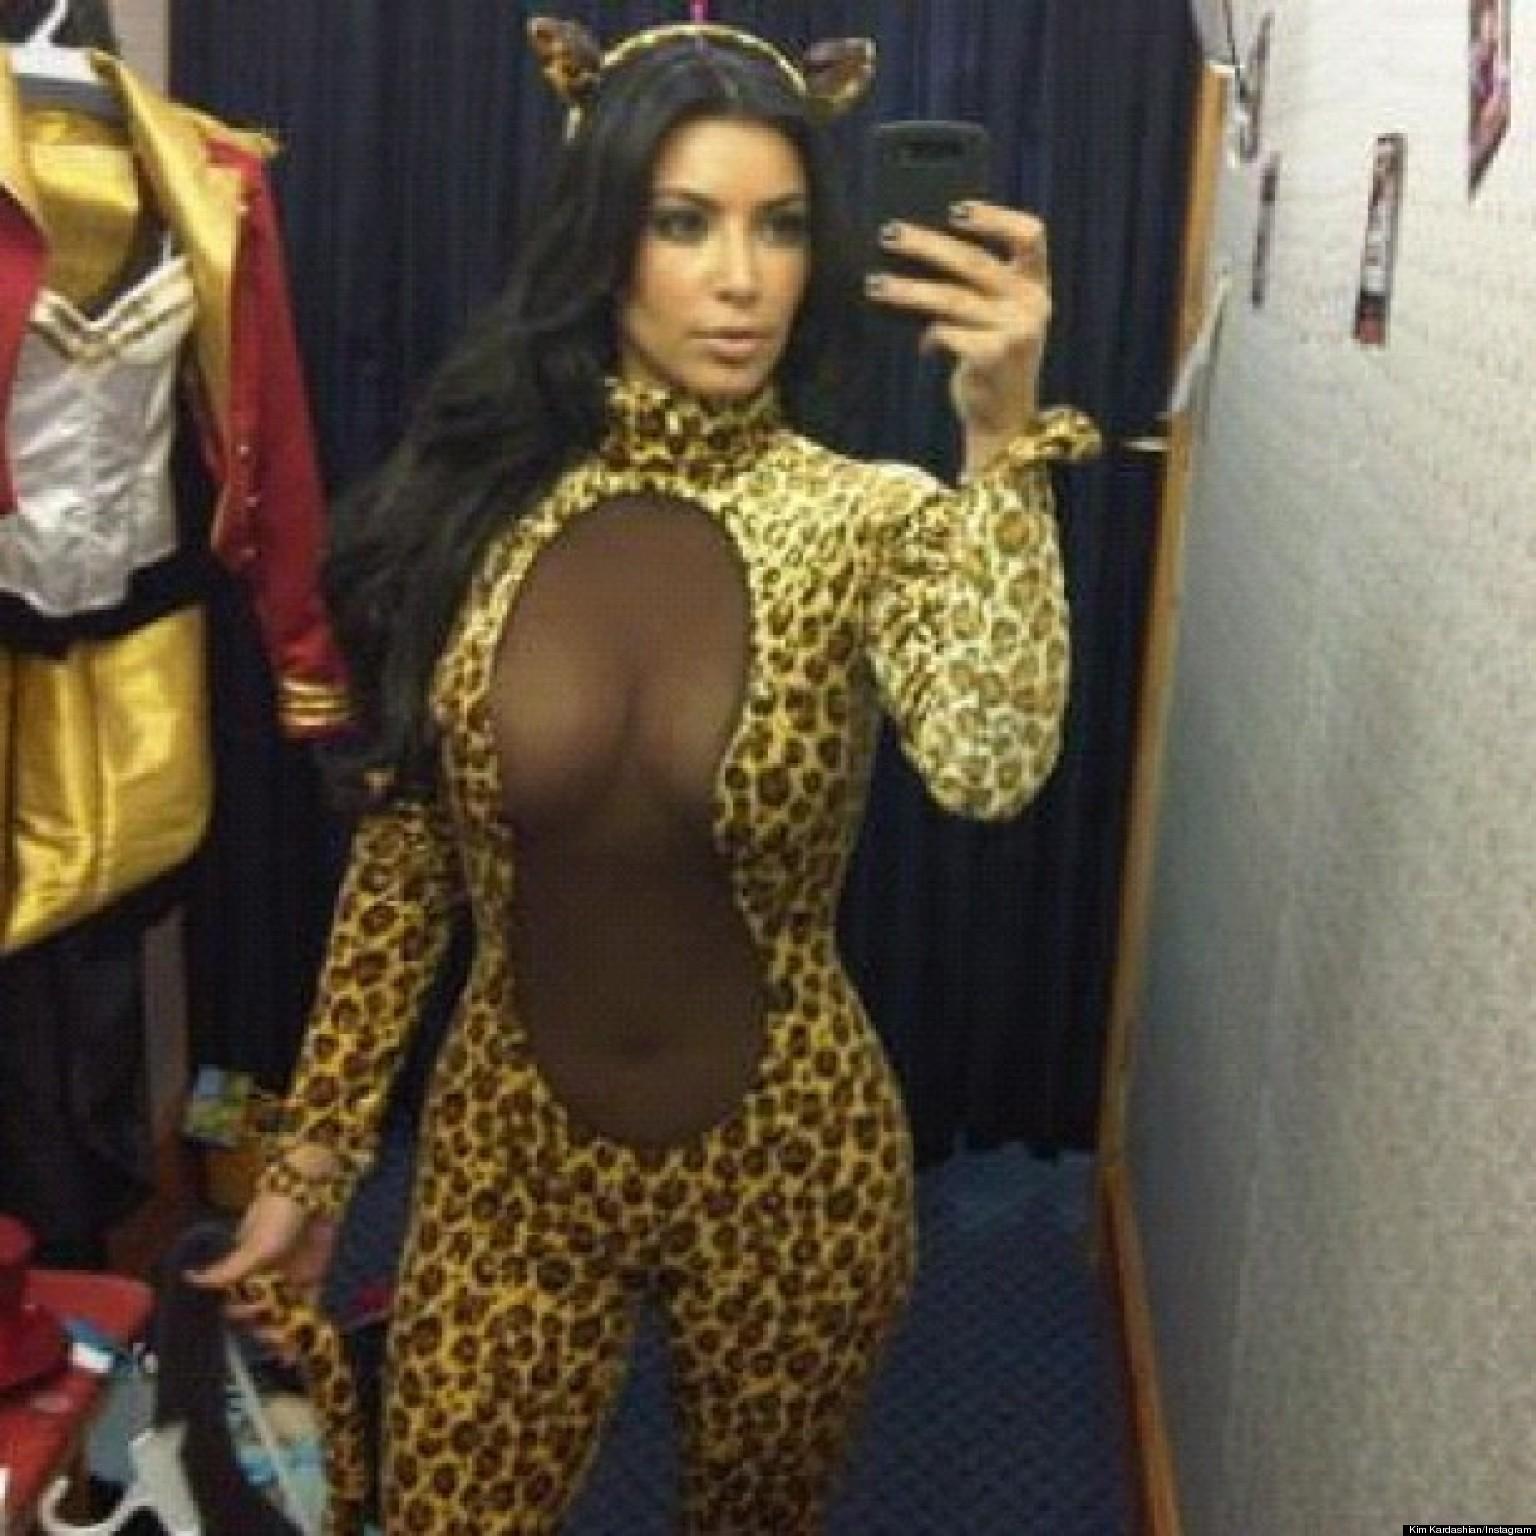 Kim Kardashianu0027s Sexy Halloween Costume Star Poses In See-Through Leopard Bodysuit (PHOTO) | HuffPost  sc 1 st  HuffPost & Kim Kardashianu0027s Sexy Halloween Costume: Star Poses In See-Through ...